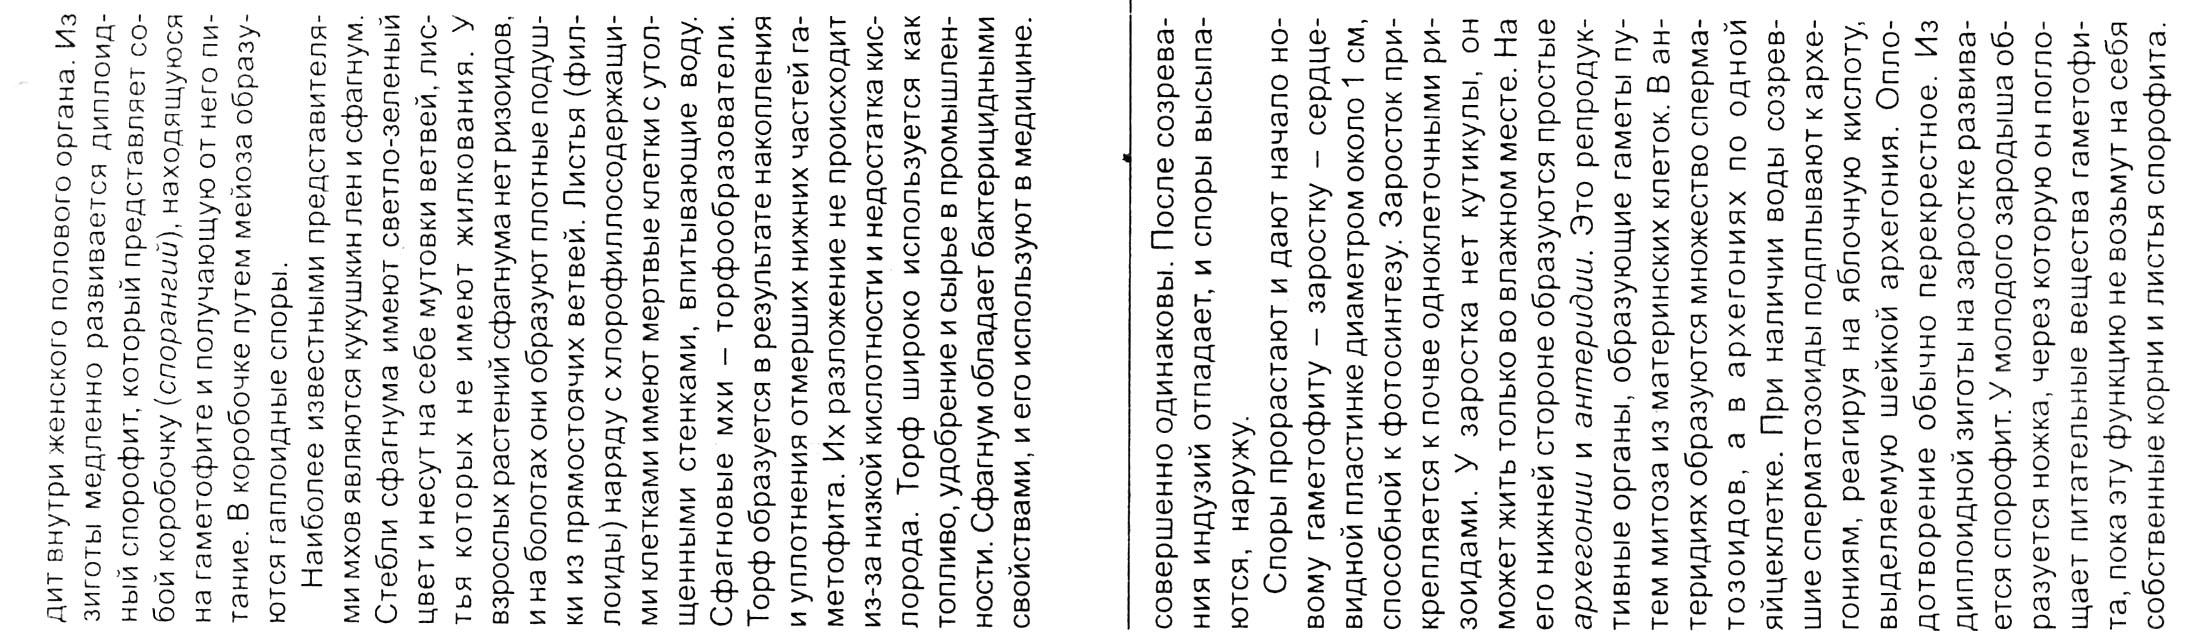 Шпаргалки по химии  5terkacom